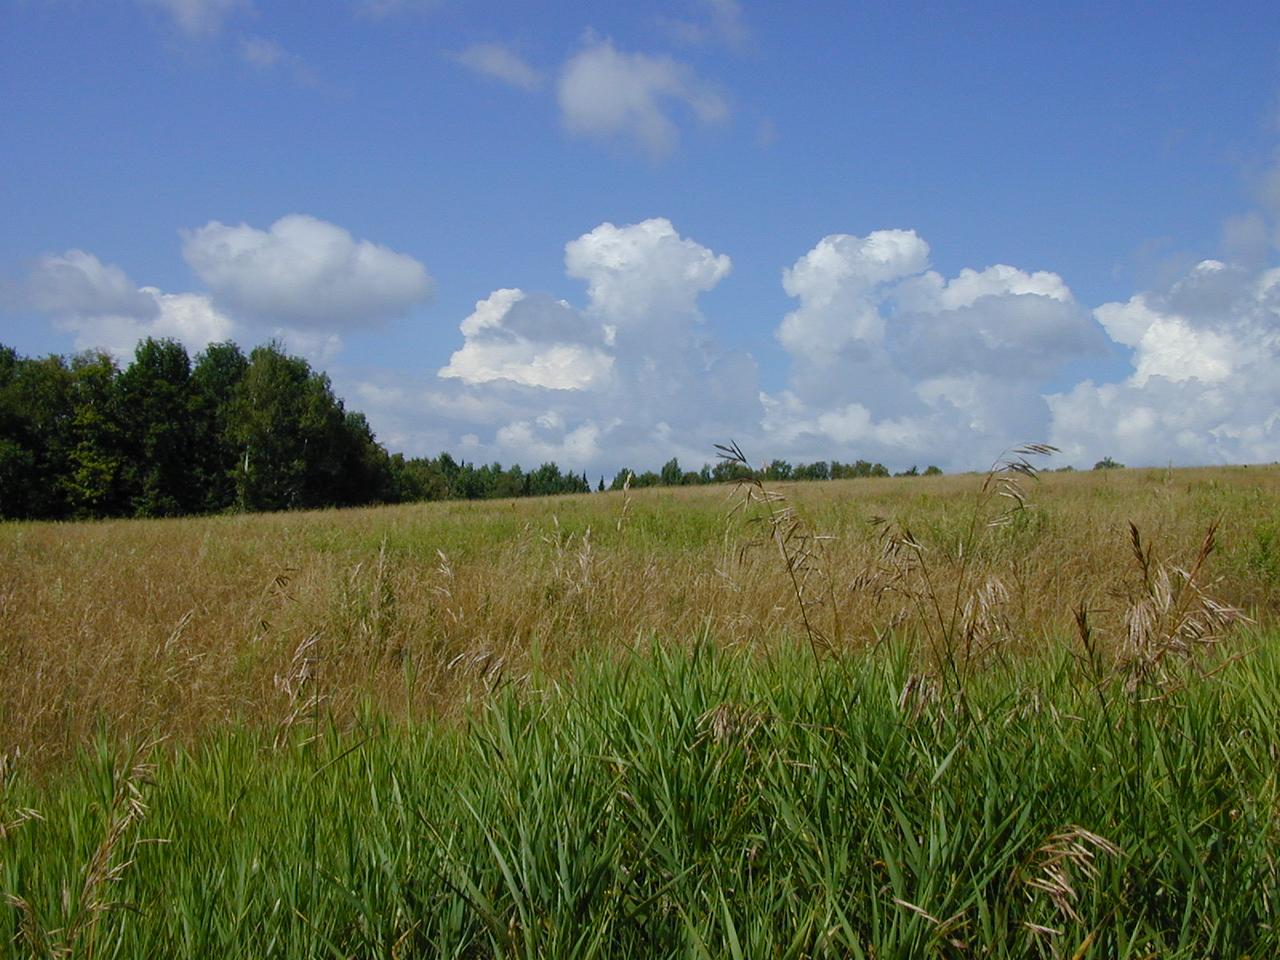 Whammy's Hill, Rangeley ME (ca. 2000)